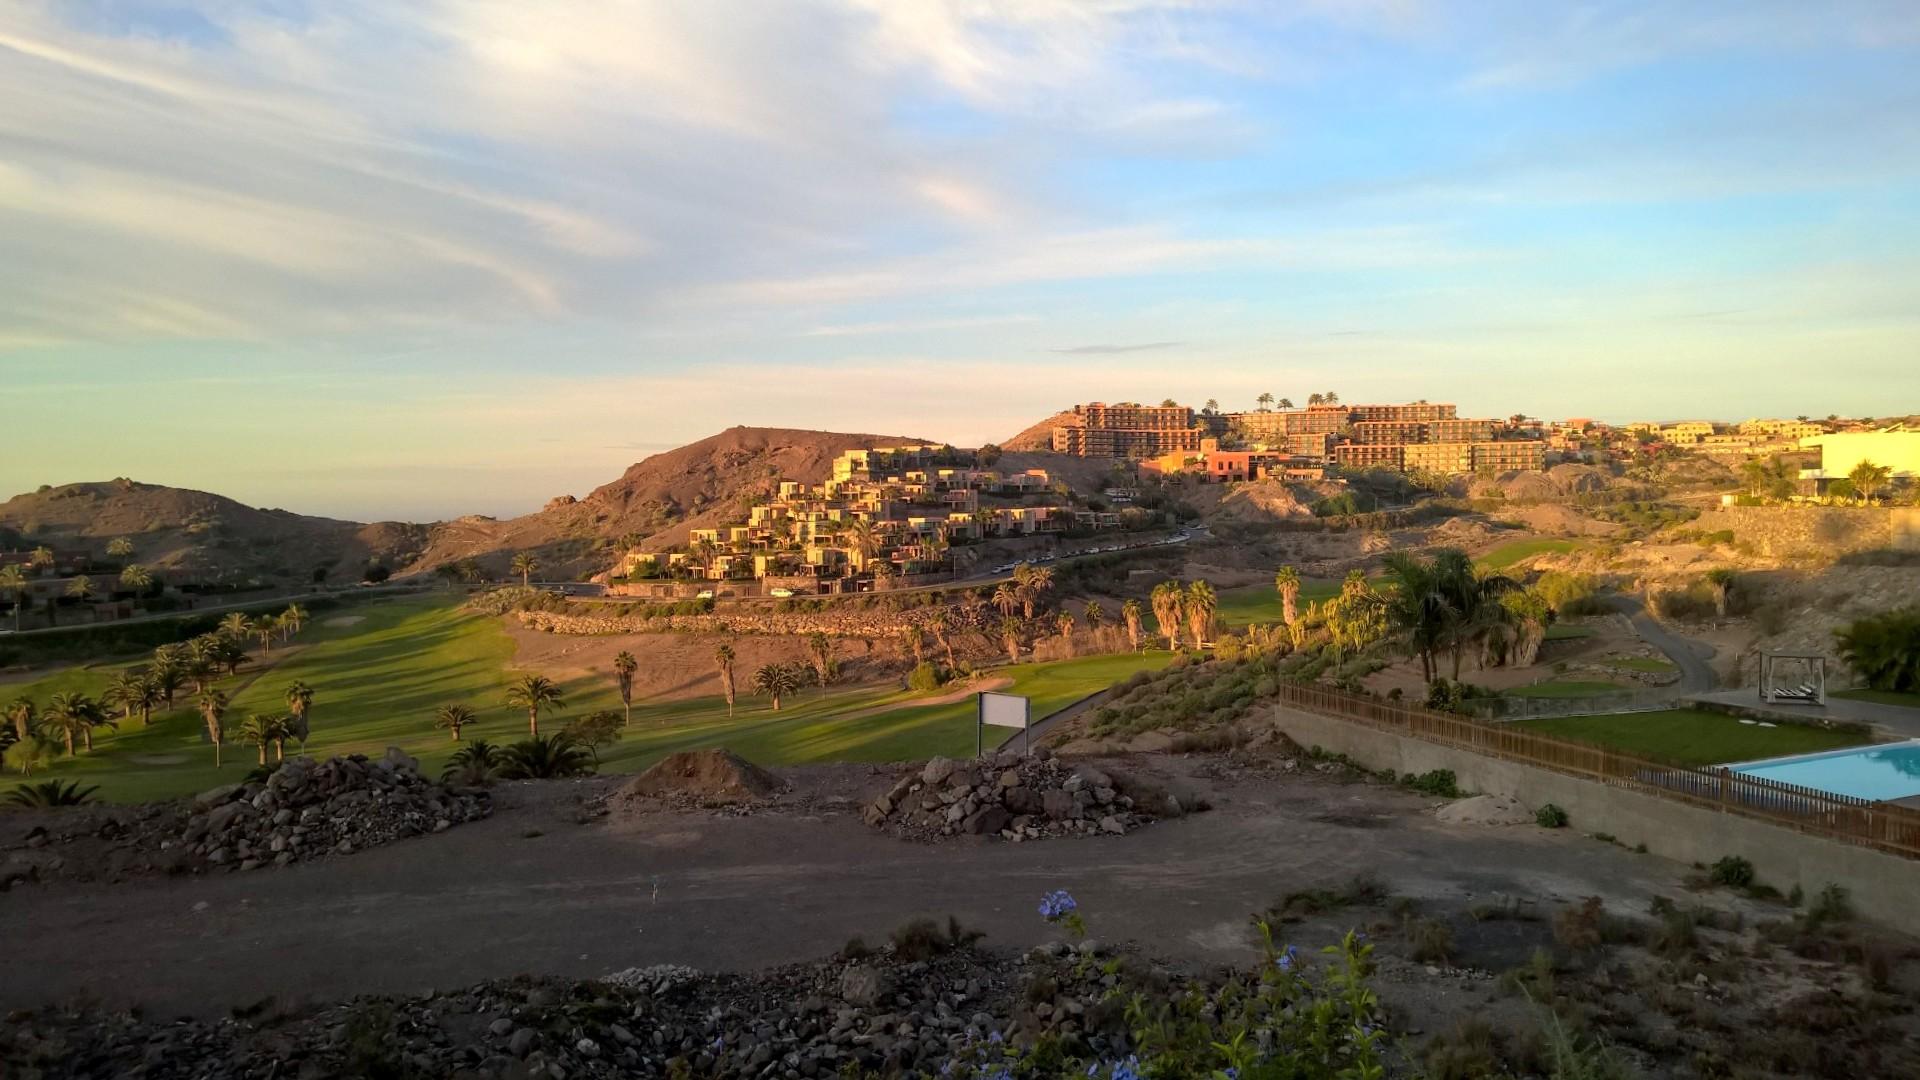 Running on Gran Canaria